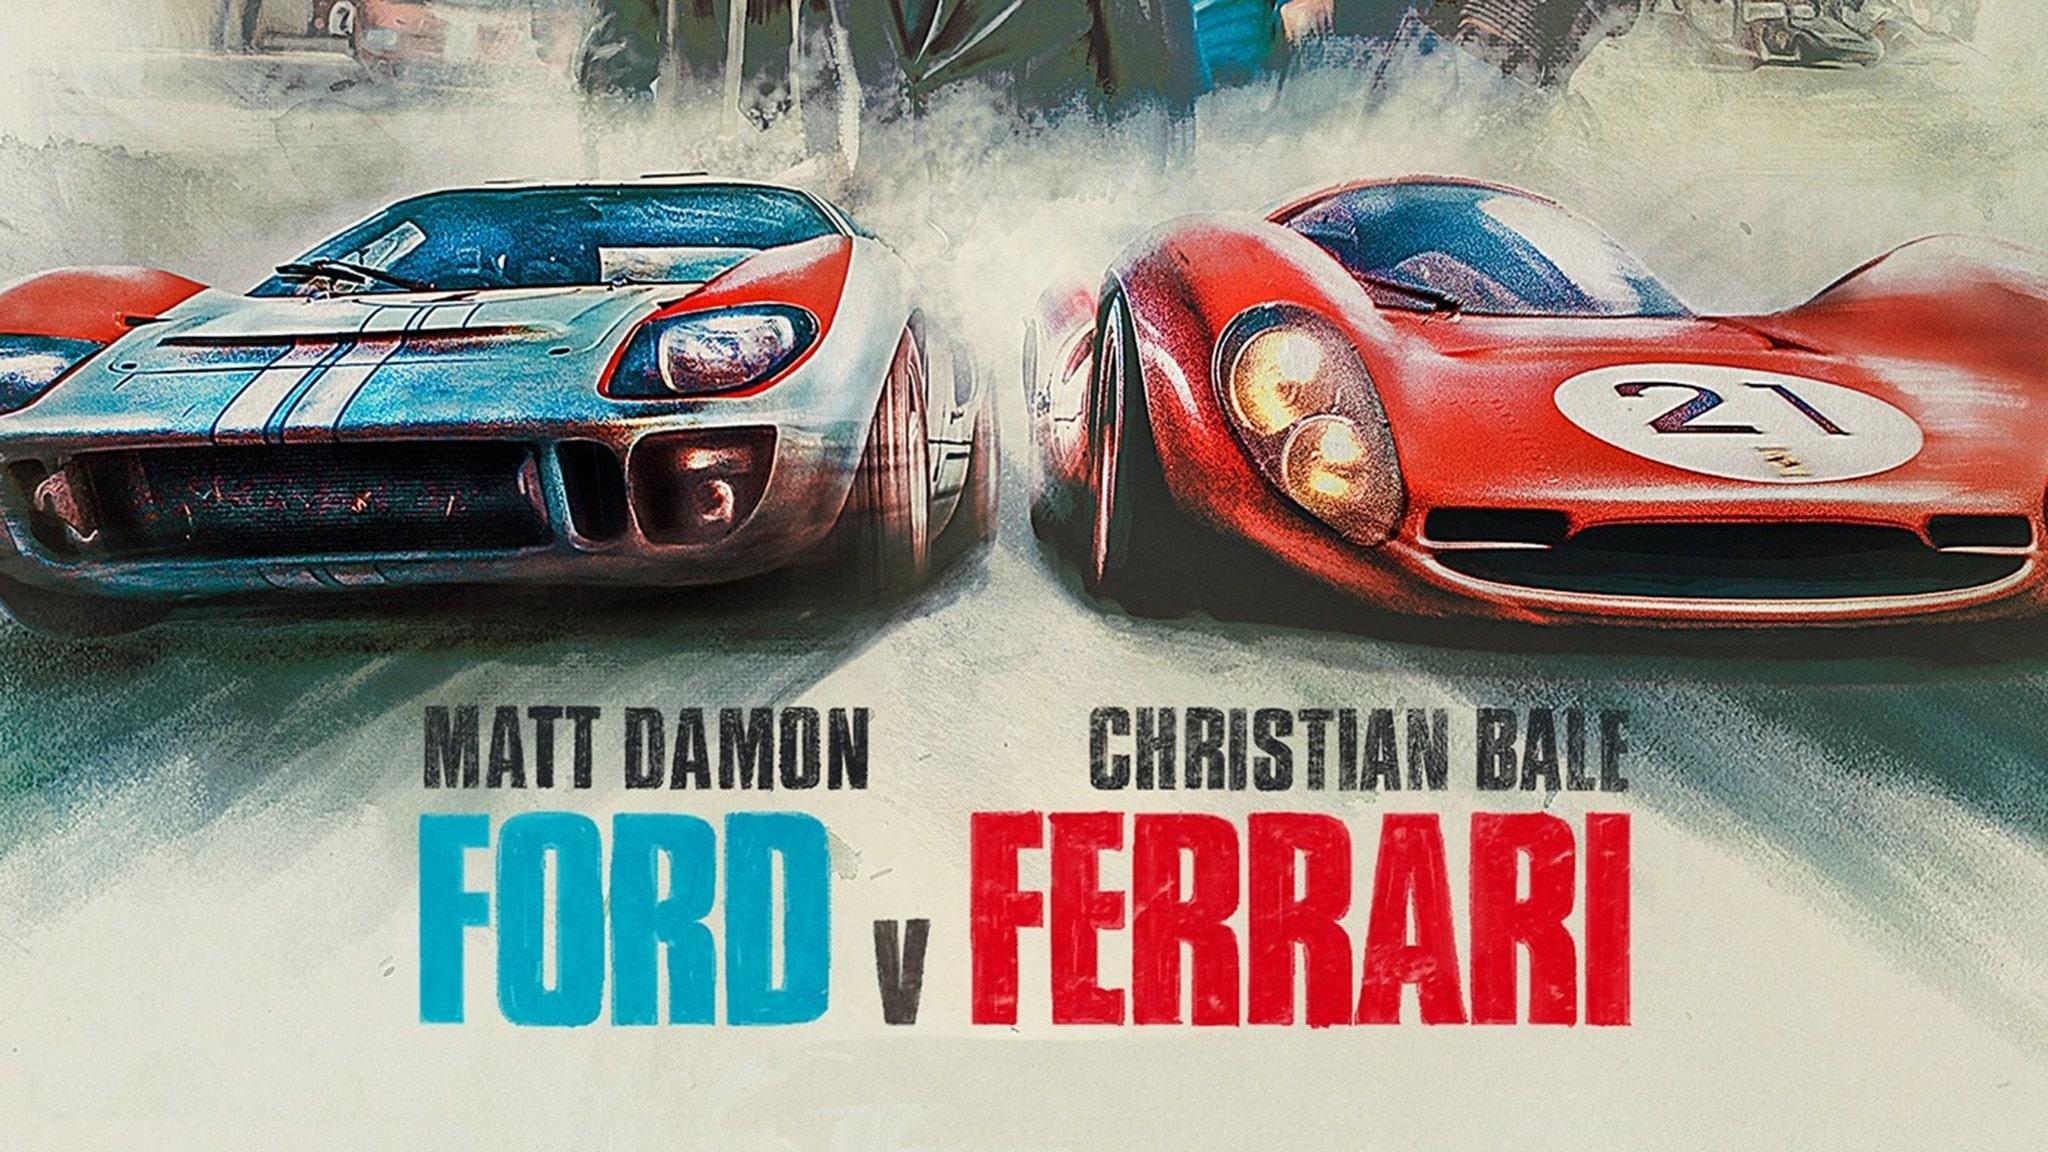 Wish Galactictechtips Xyz الصور والأفكار حول Ford Vs Ferrari Free Stream Reddit